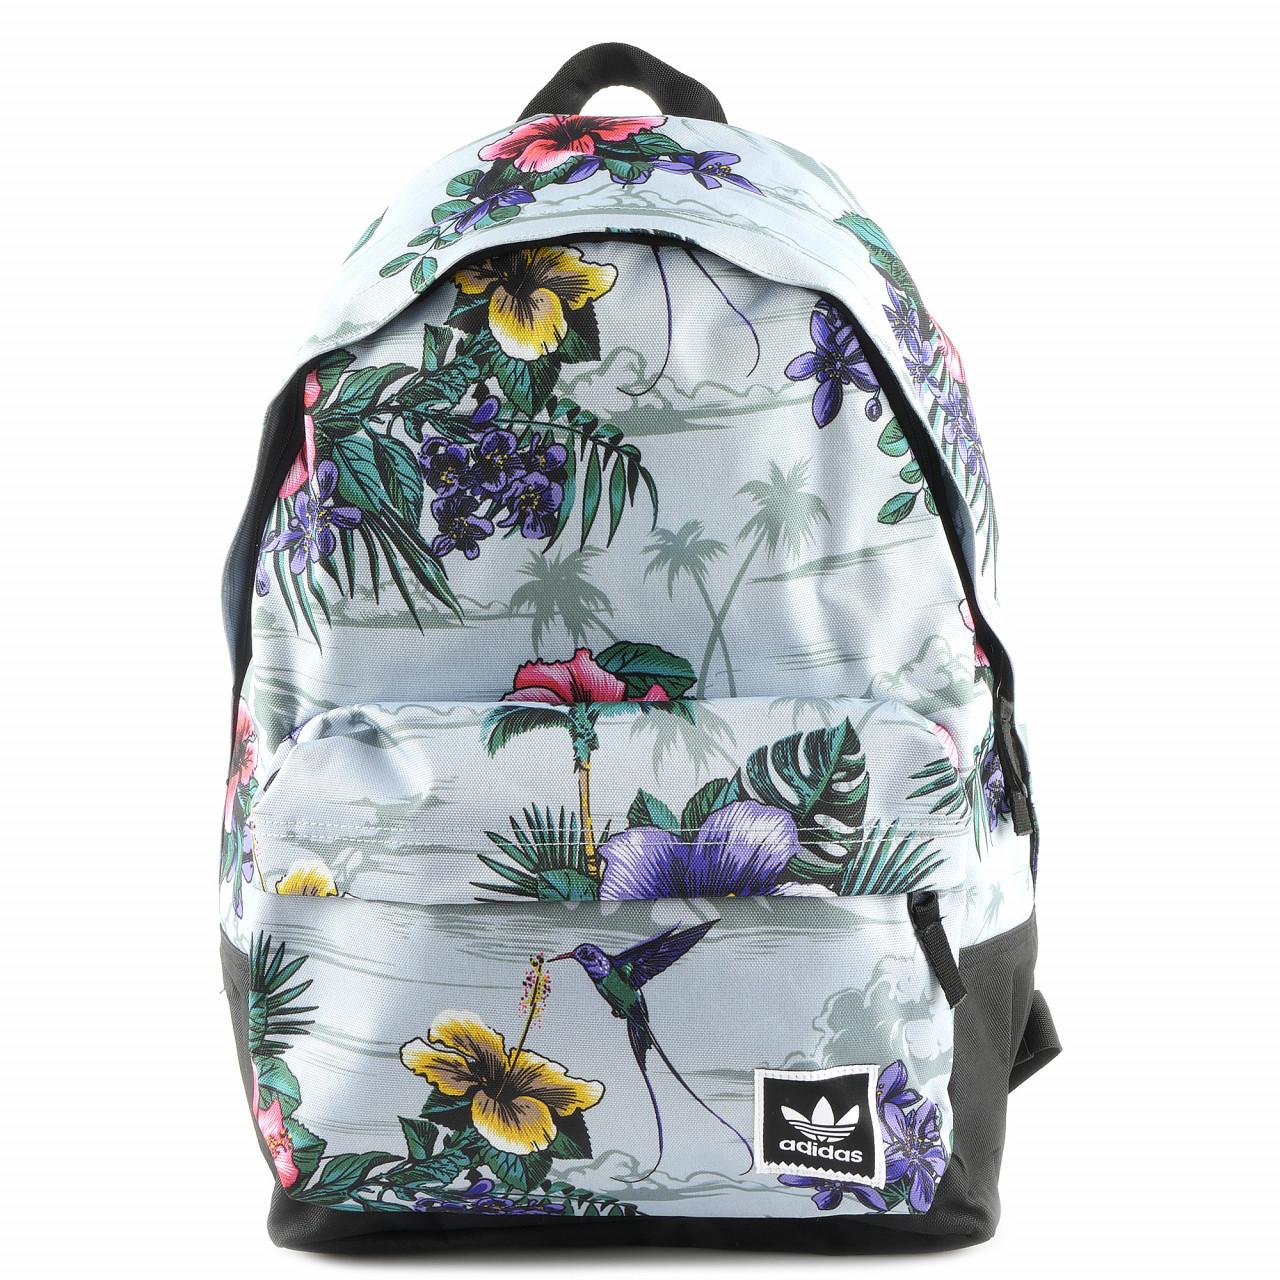 Island Backpack - Multicolor